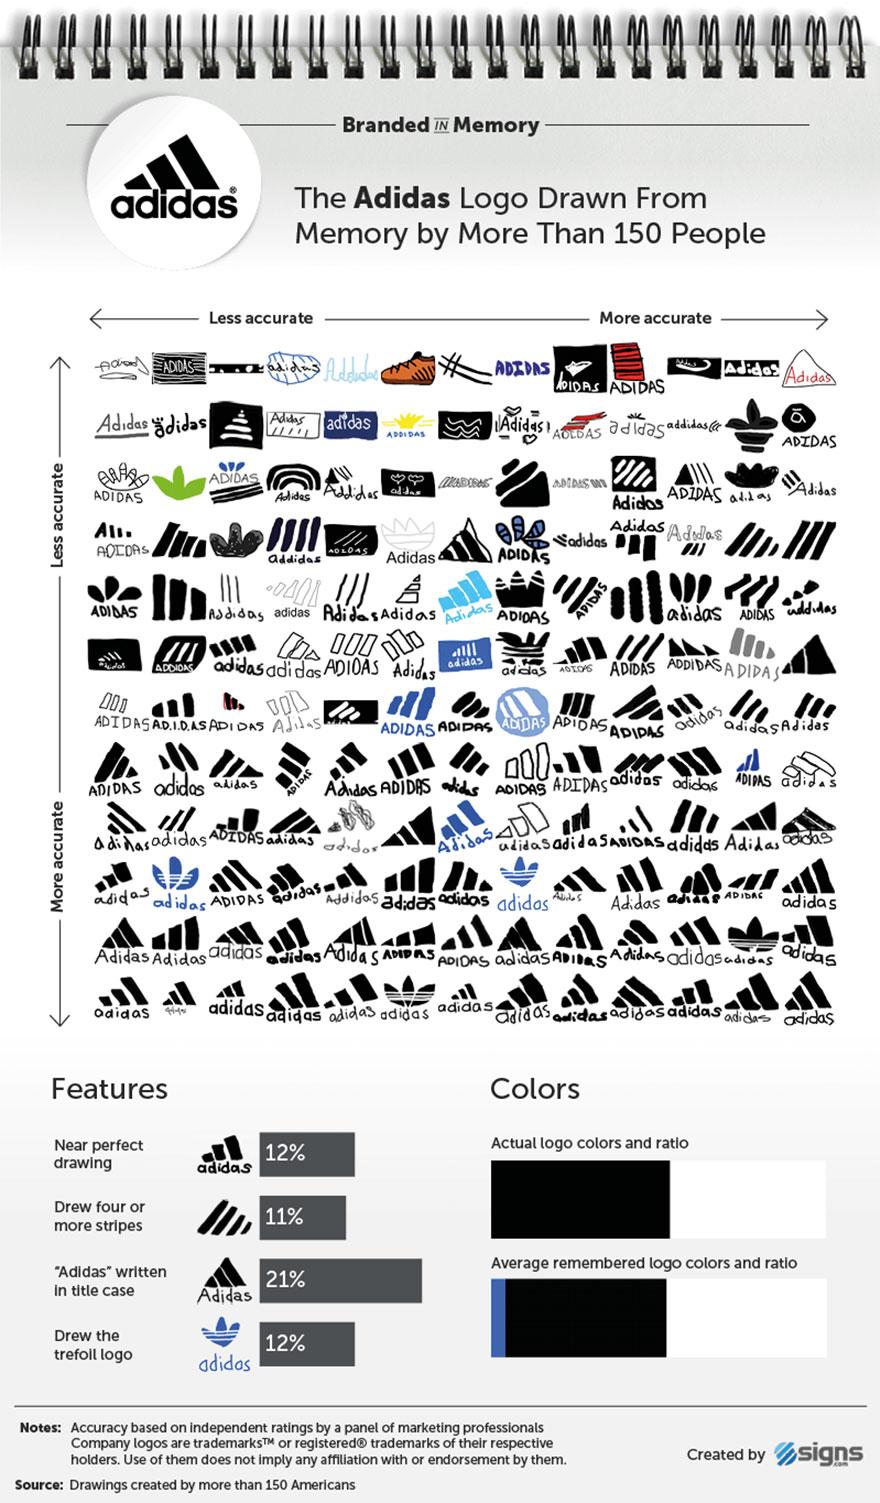 famous-brand-logos-drawn-from-memory-5-59d2463cb18c0__880.jpg